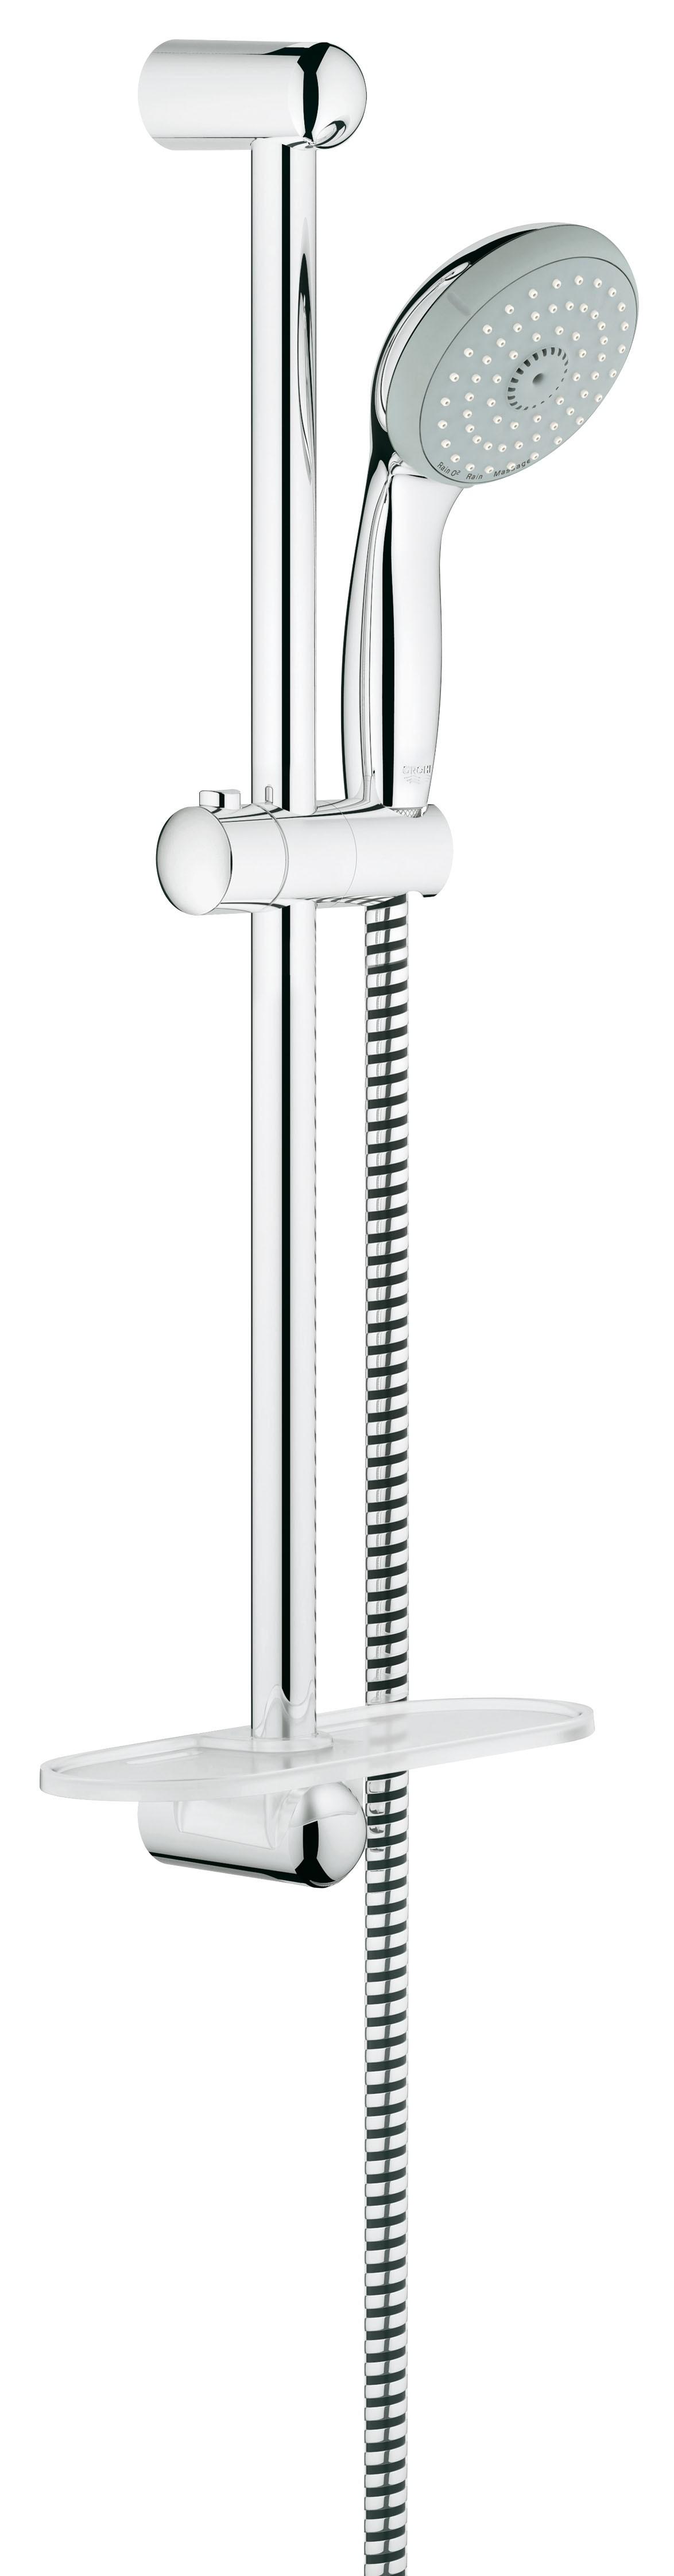 Grohe 27927000 Tempesta Classic (ручной душ, штанга 600 мм, шланг 1750 мм), хром